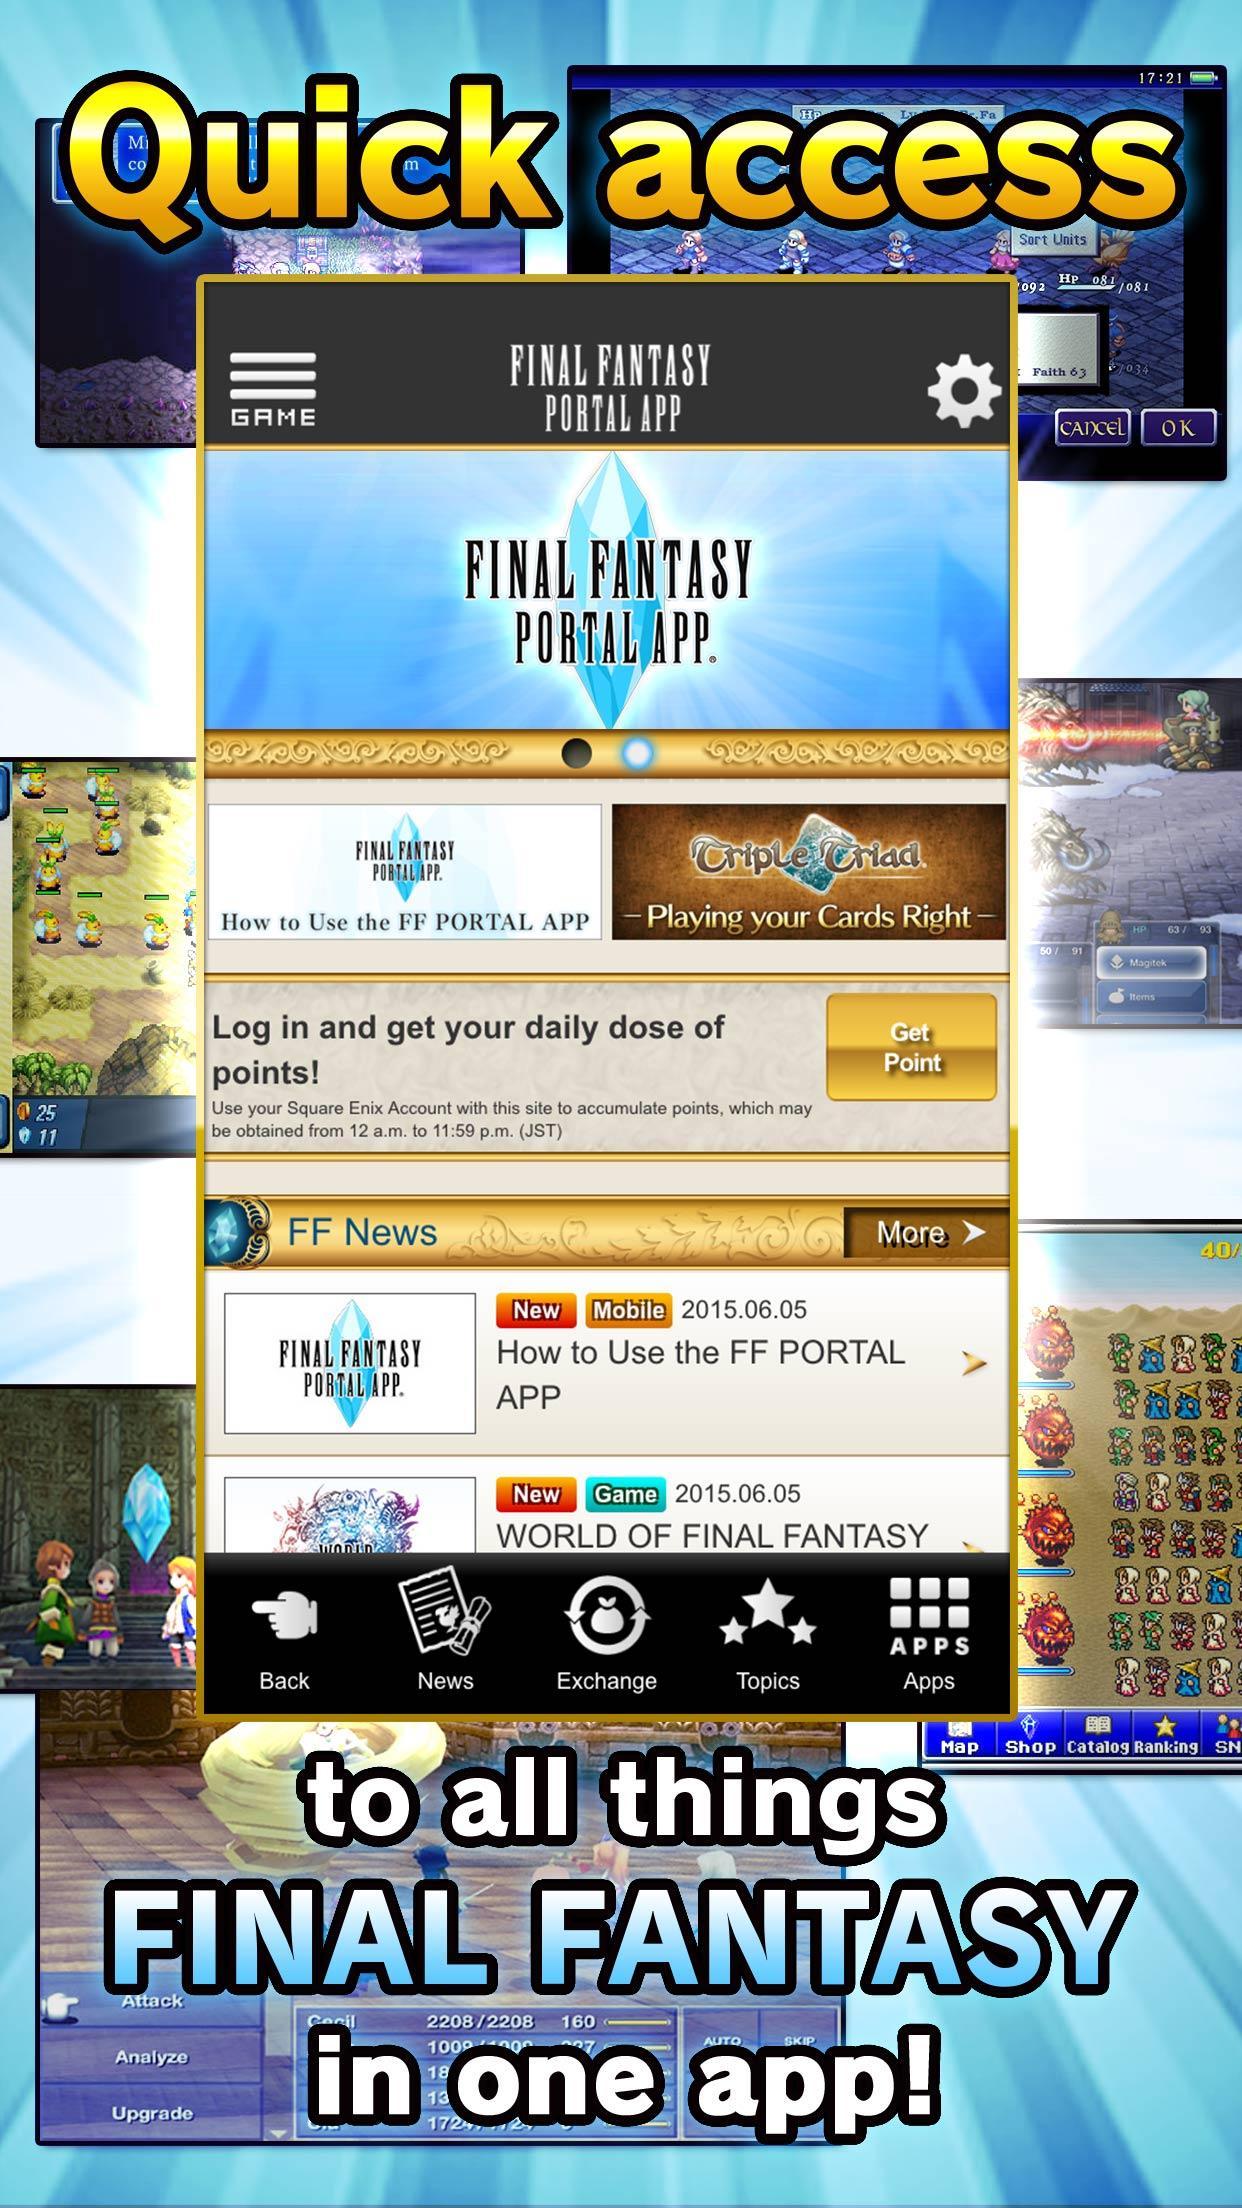 FINAL FANTASY PORTAL APP screenshot #12